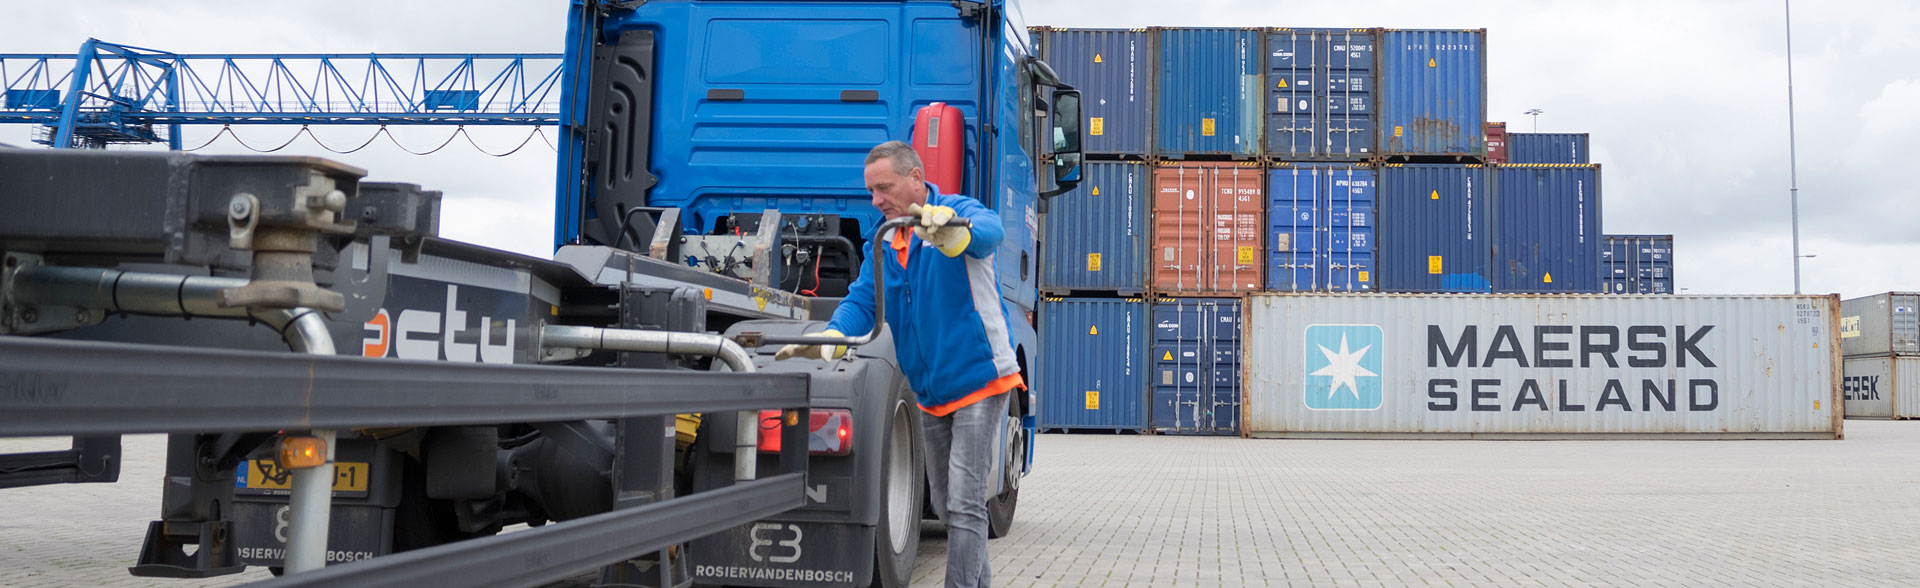 Business park Medel Loading and unloading